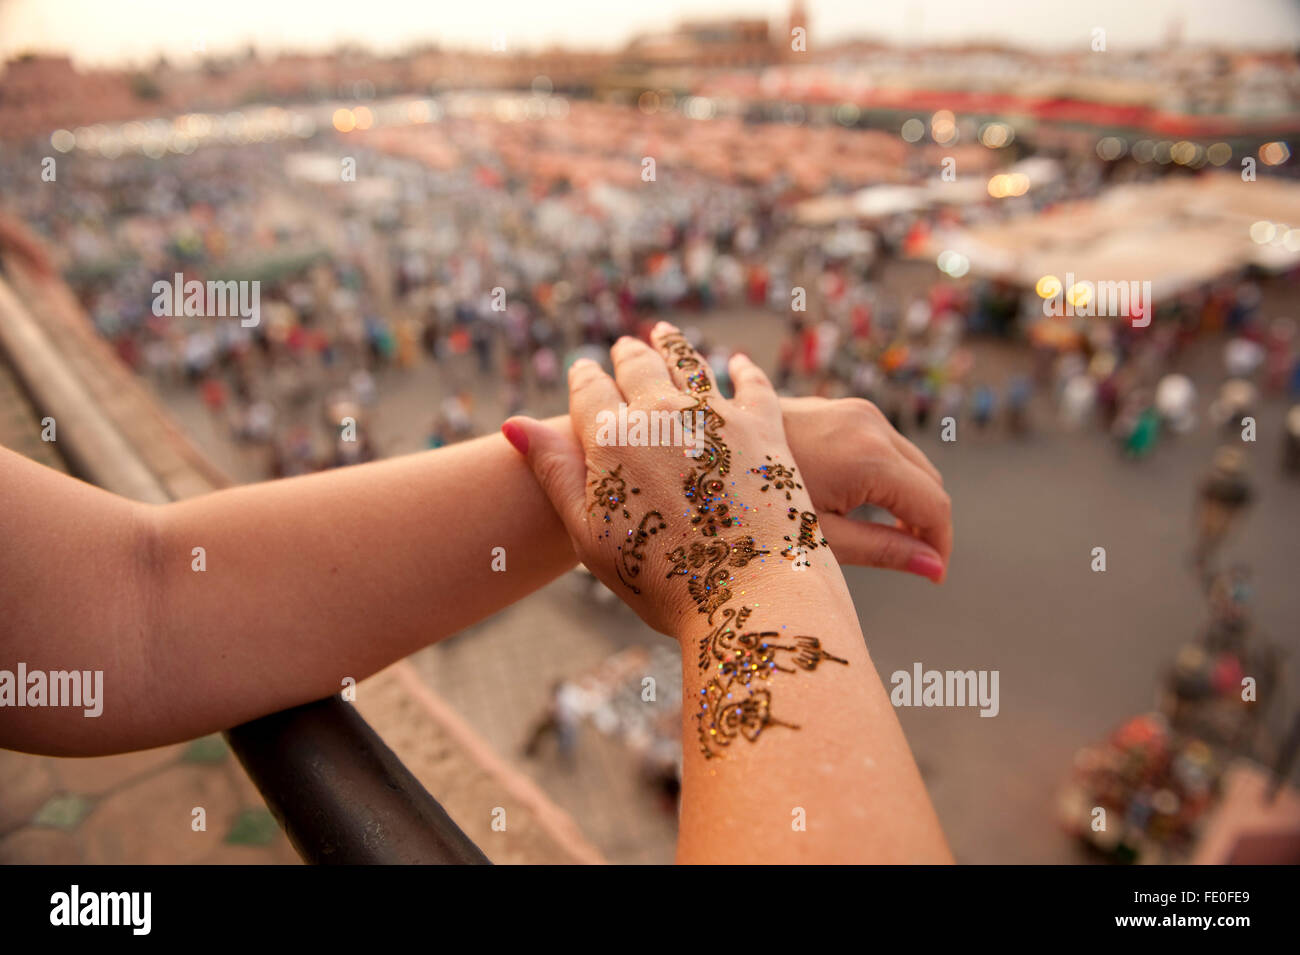 Hand with Henna Tattoo, Djemaa el-Fna, Marrakesh, Morocco - Stock Image